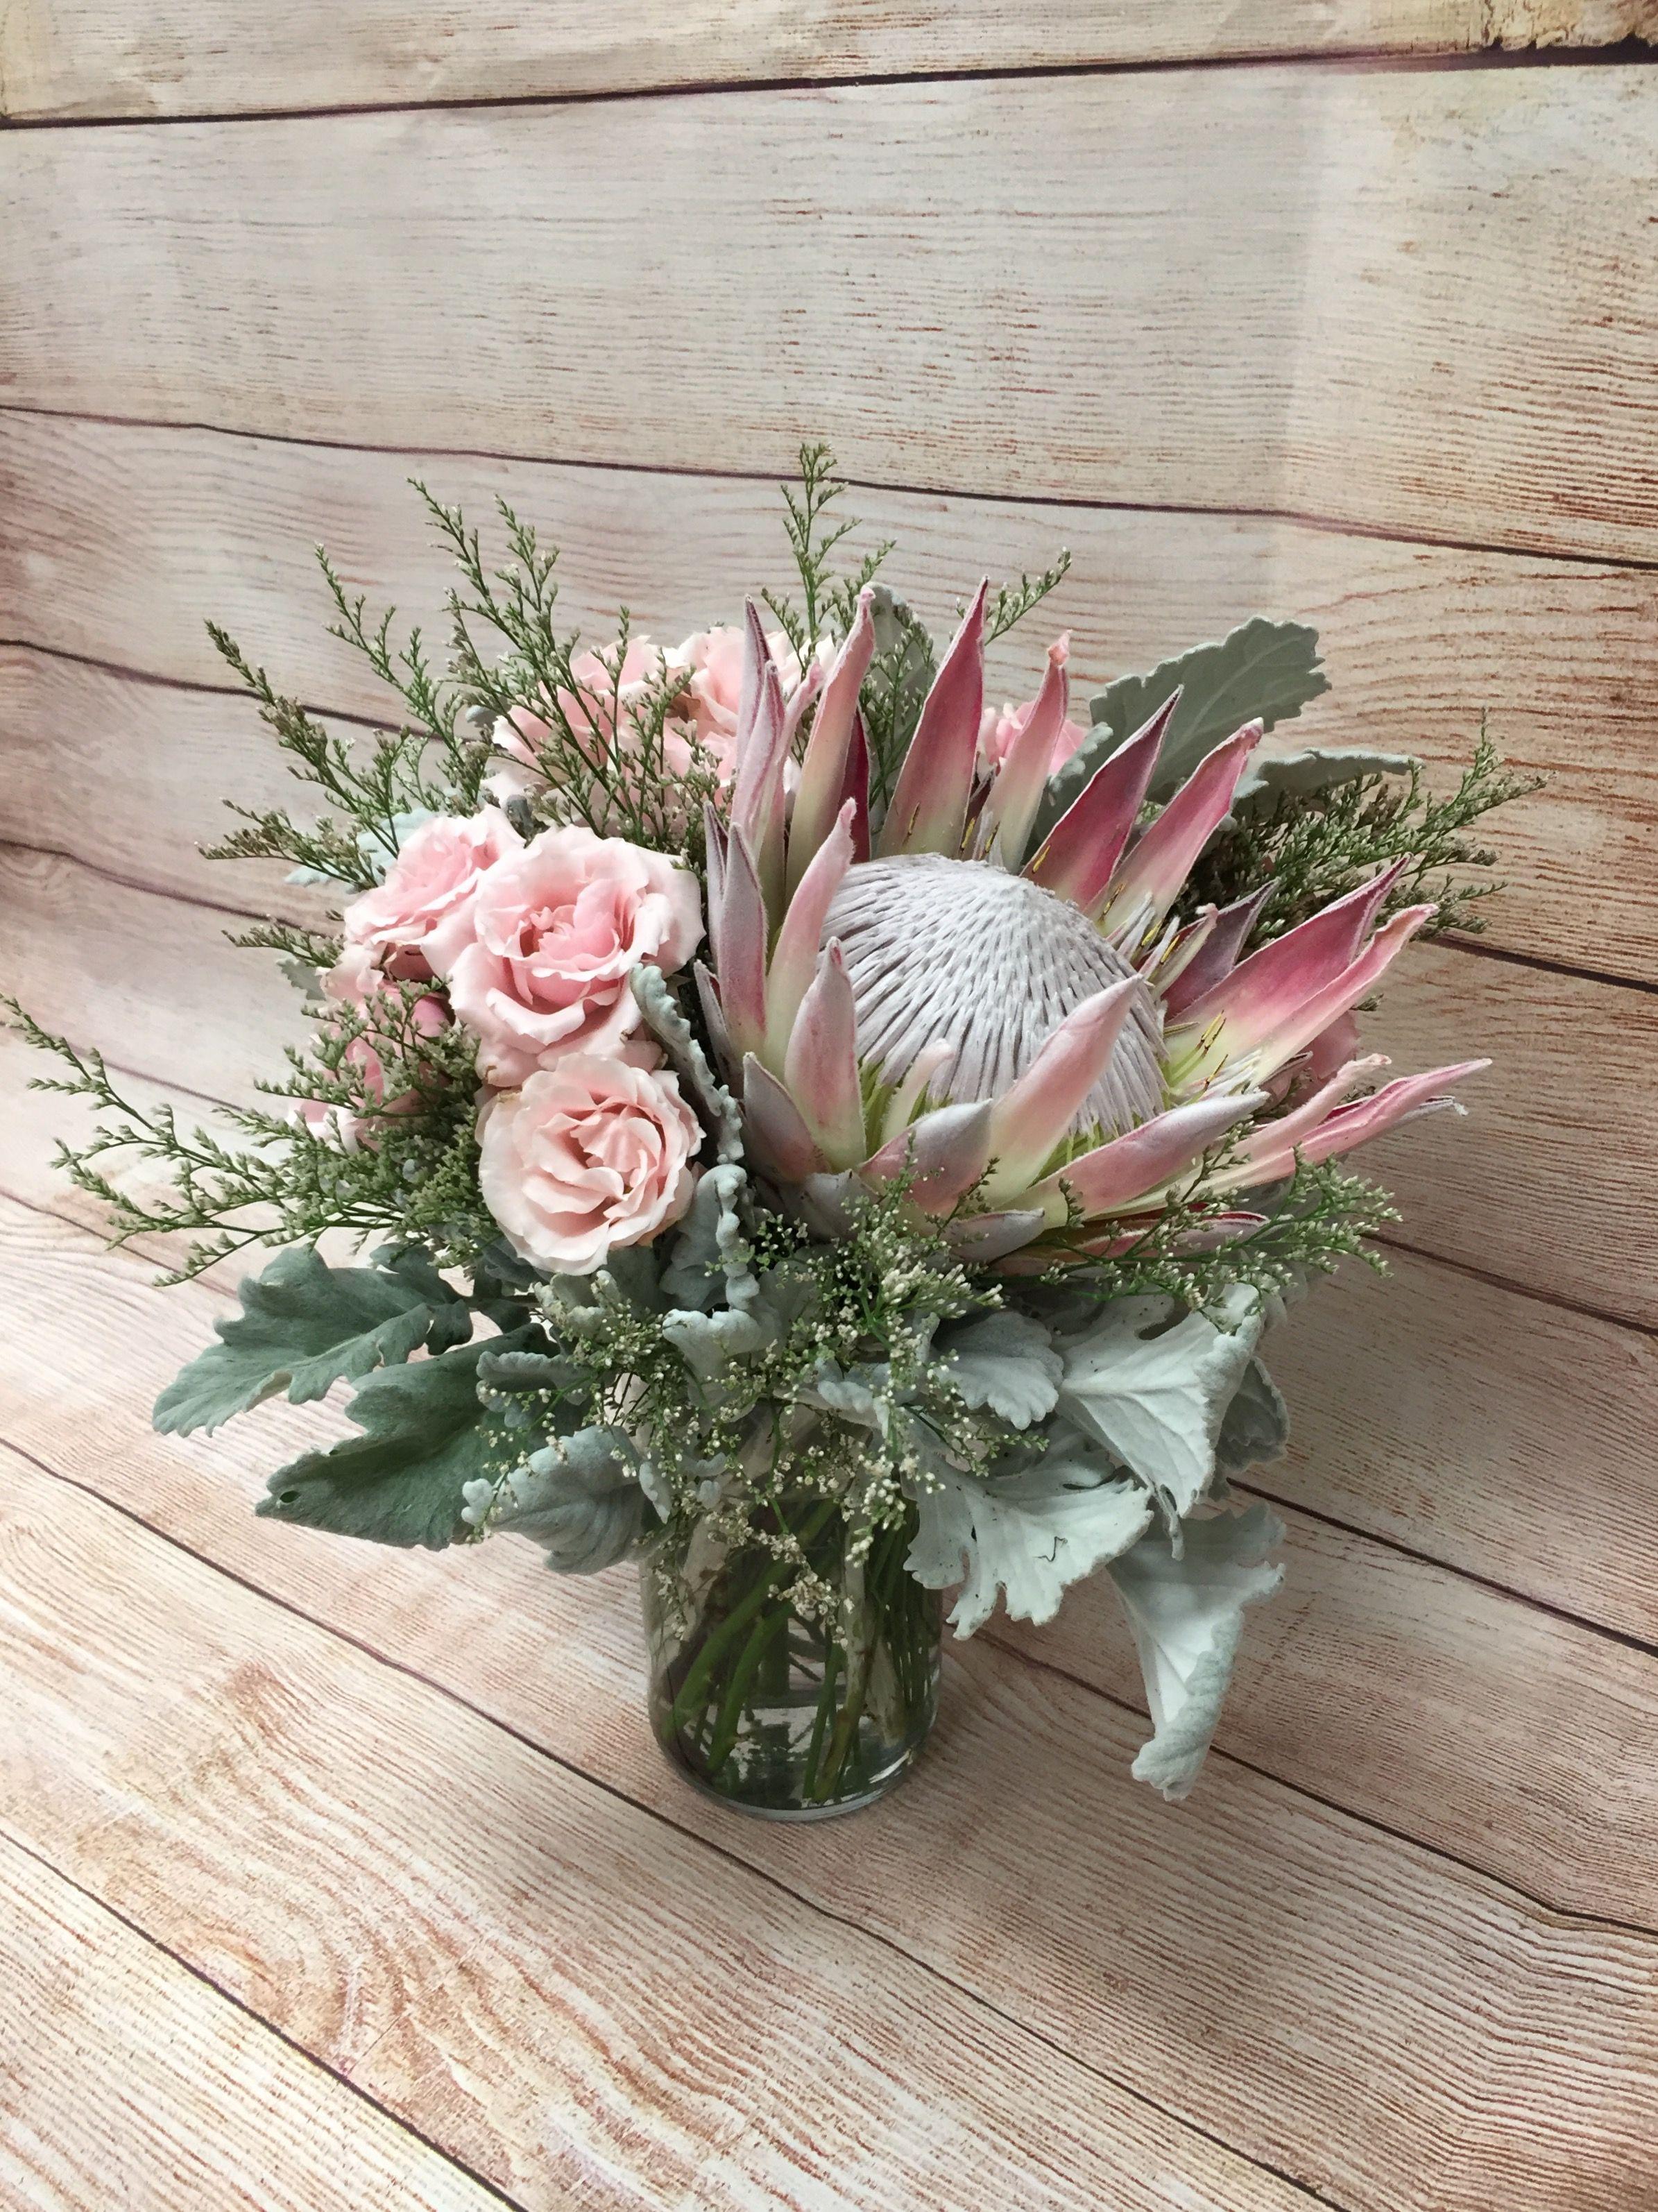 King protea rose boho garden centerpiece flower bouquet for King protea flower arrangements